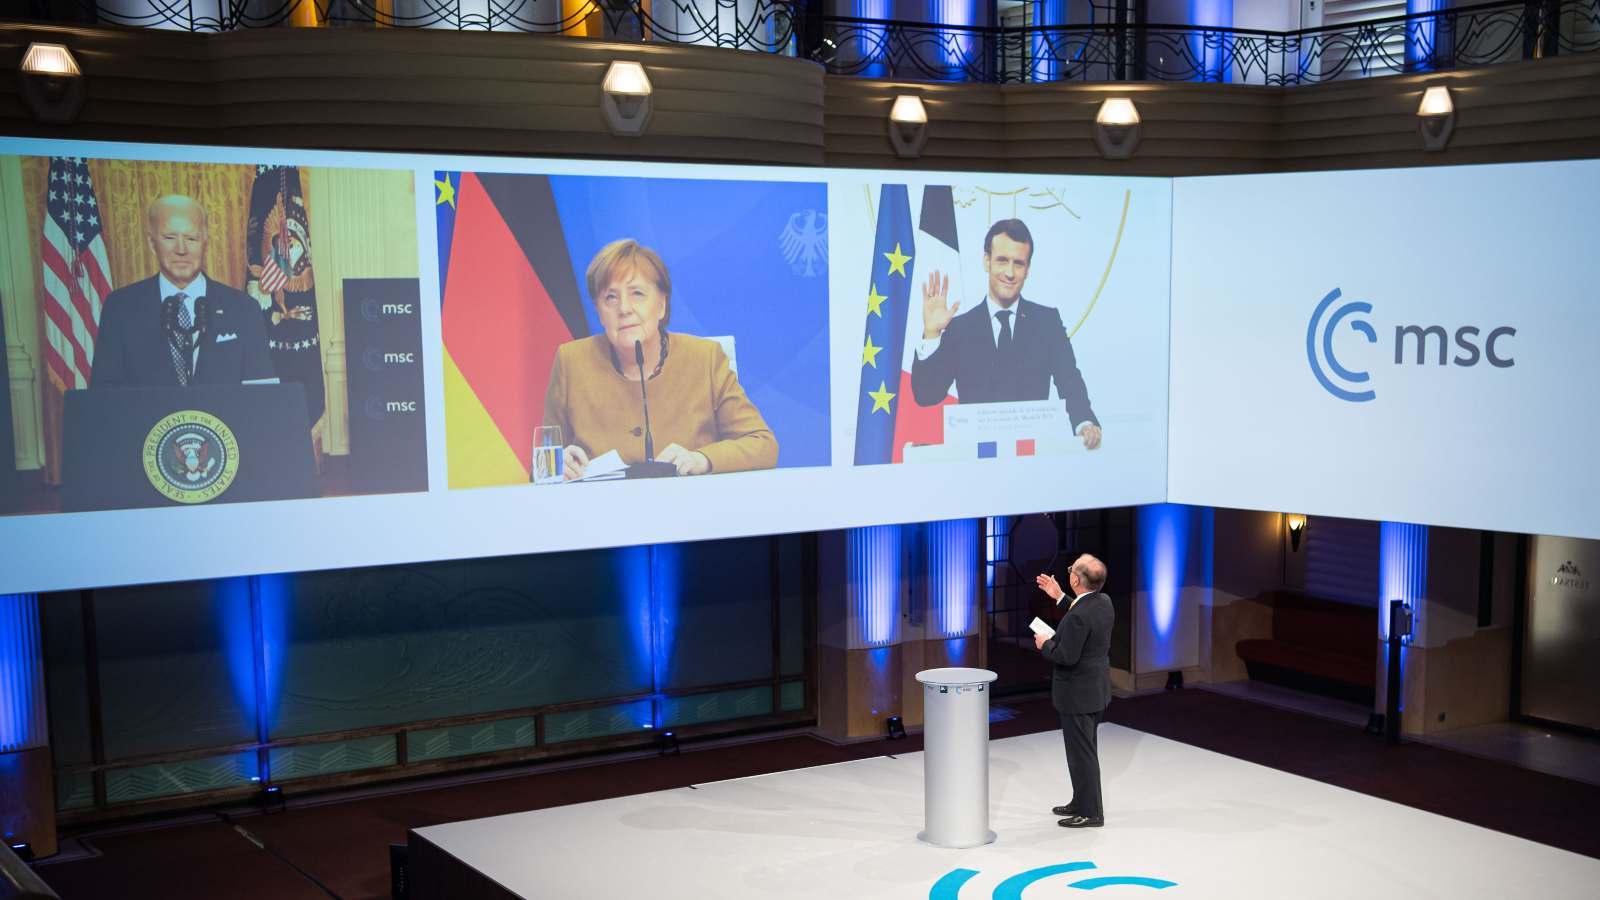 Joe Biden, Angela Merkel, and Emmanuel Macron just before delivering their remarks